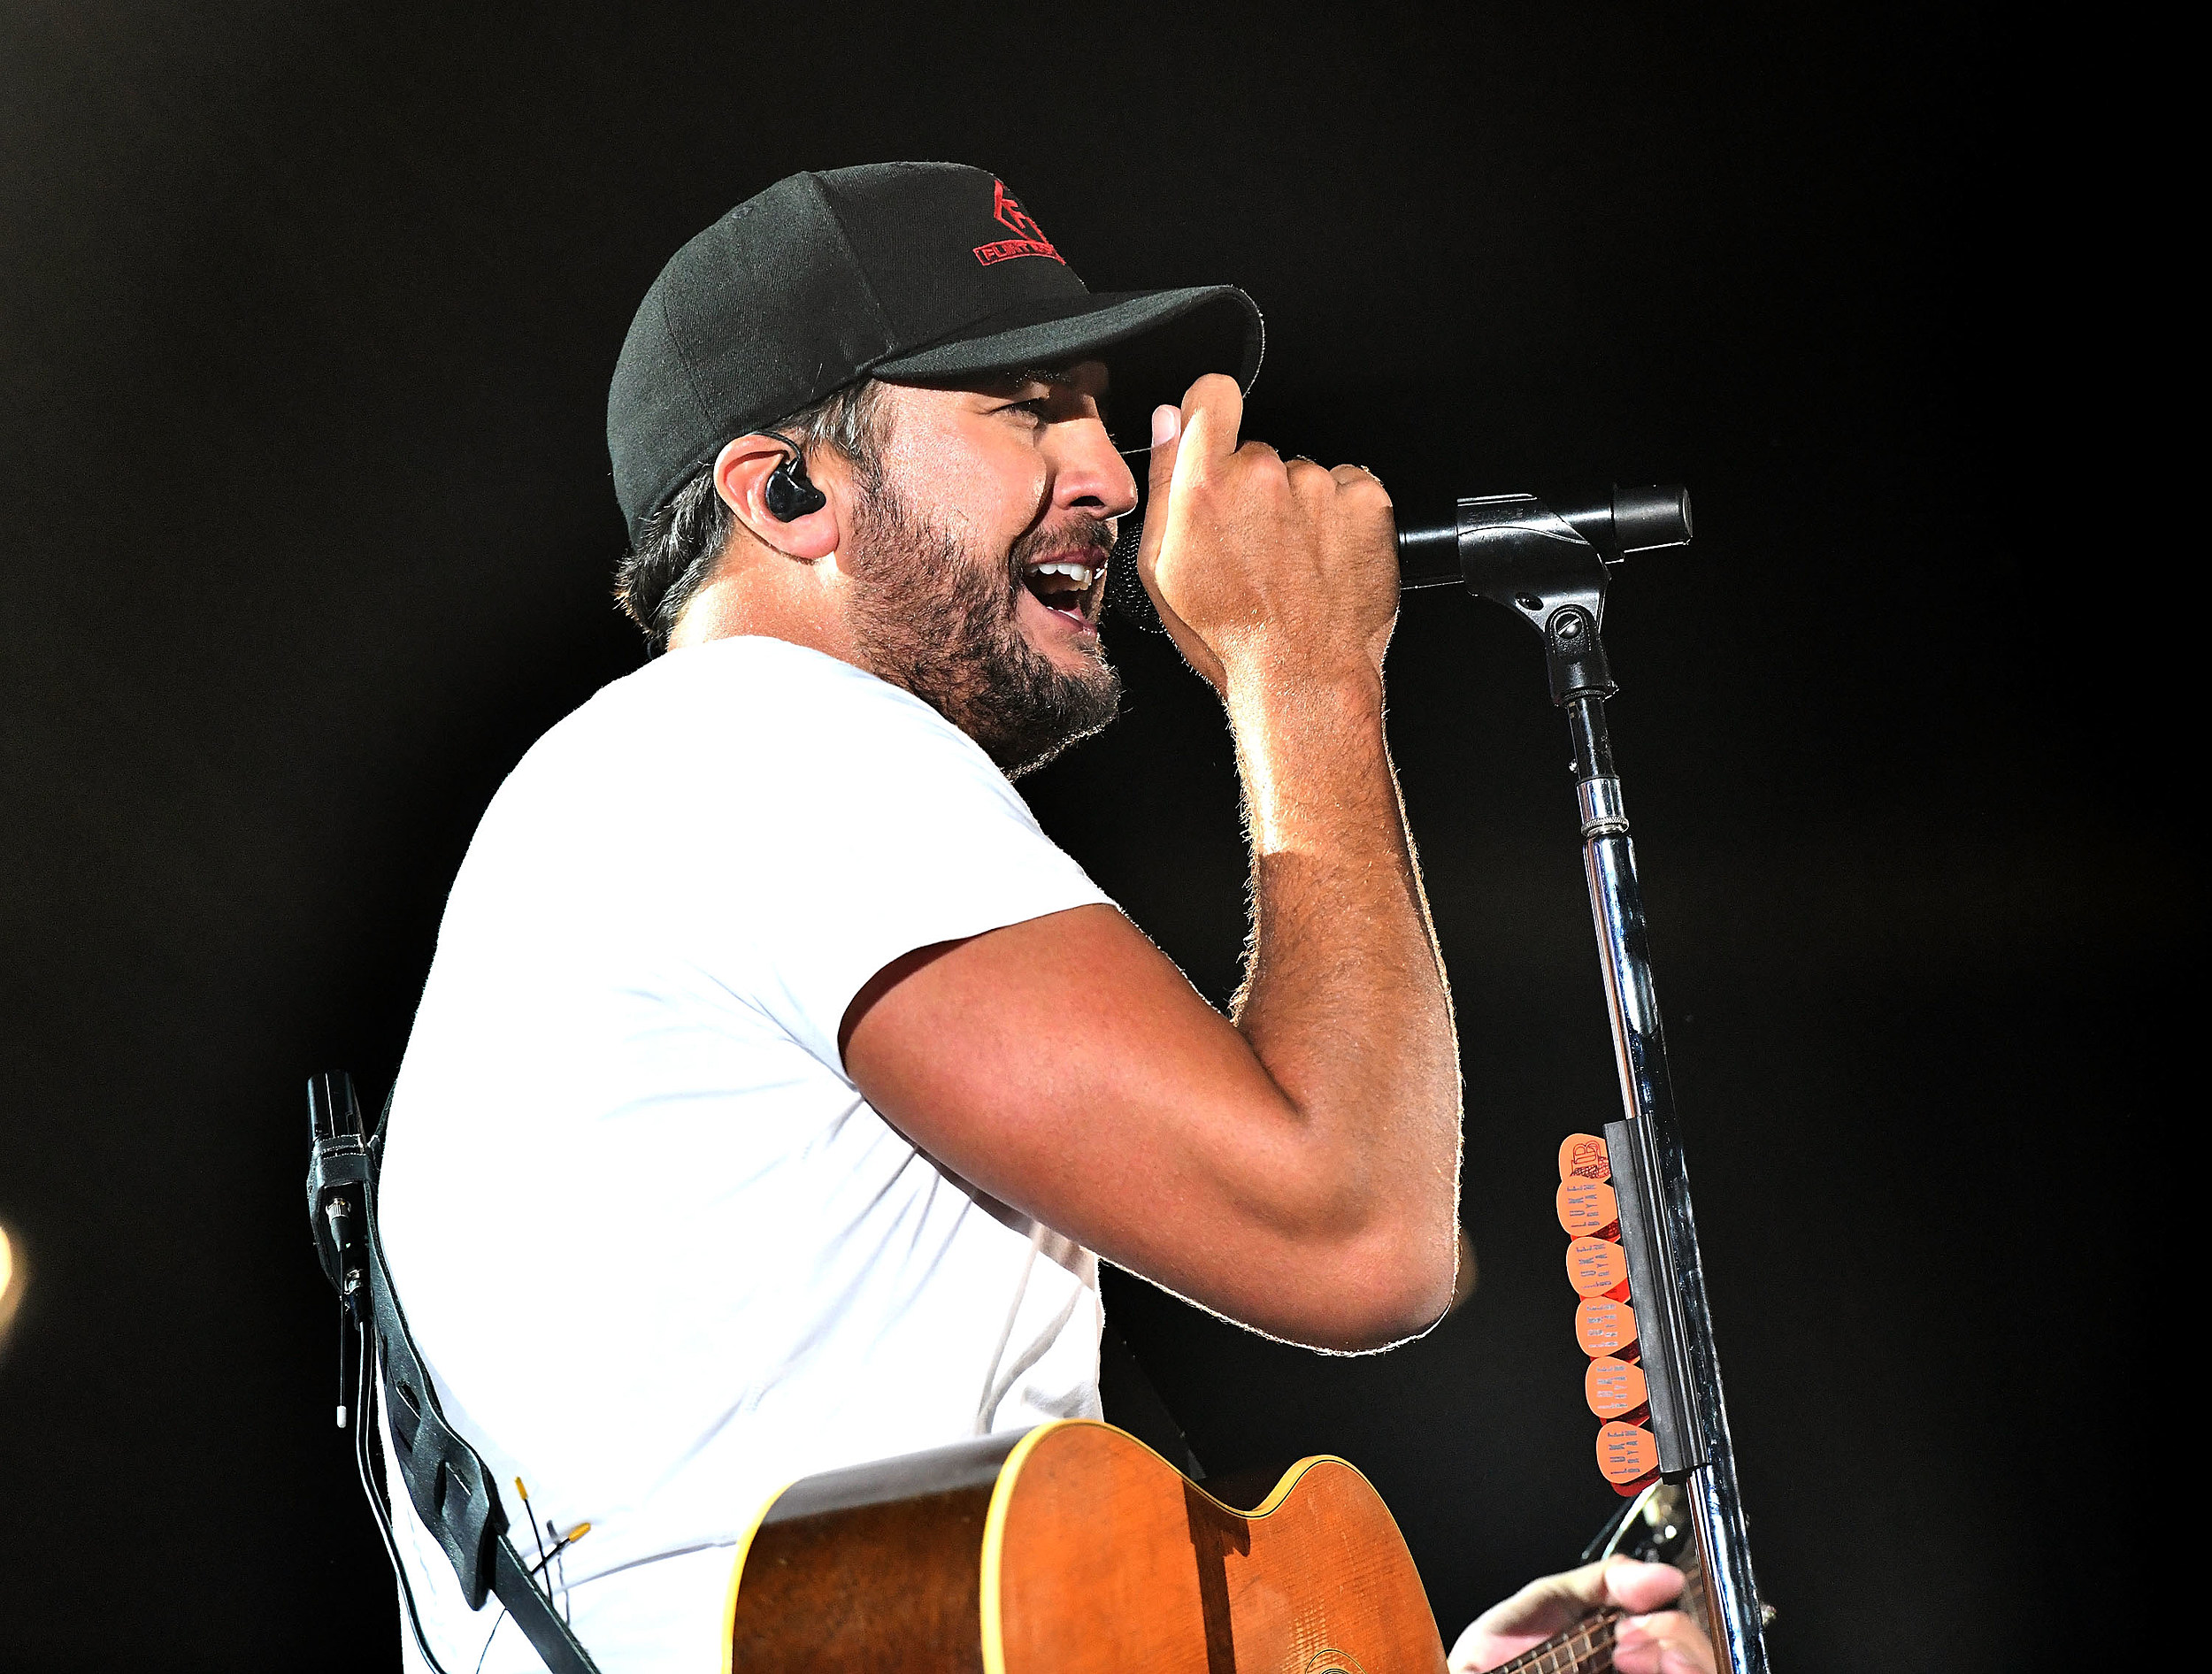 Blake Shelton's Ole Red Bar Faces Lawsuit in Nashville